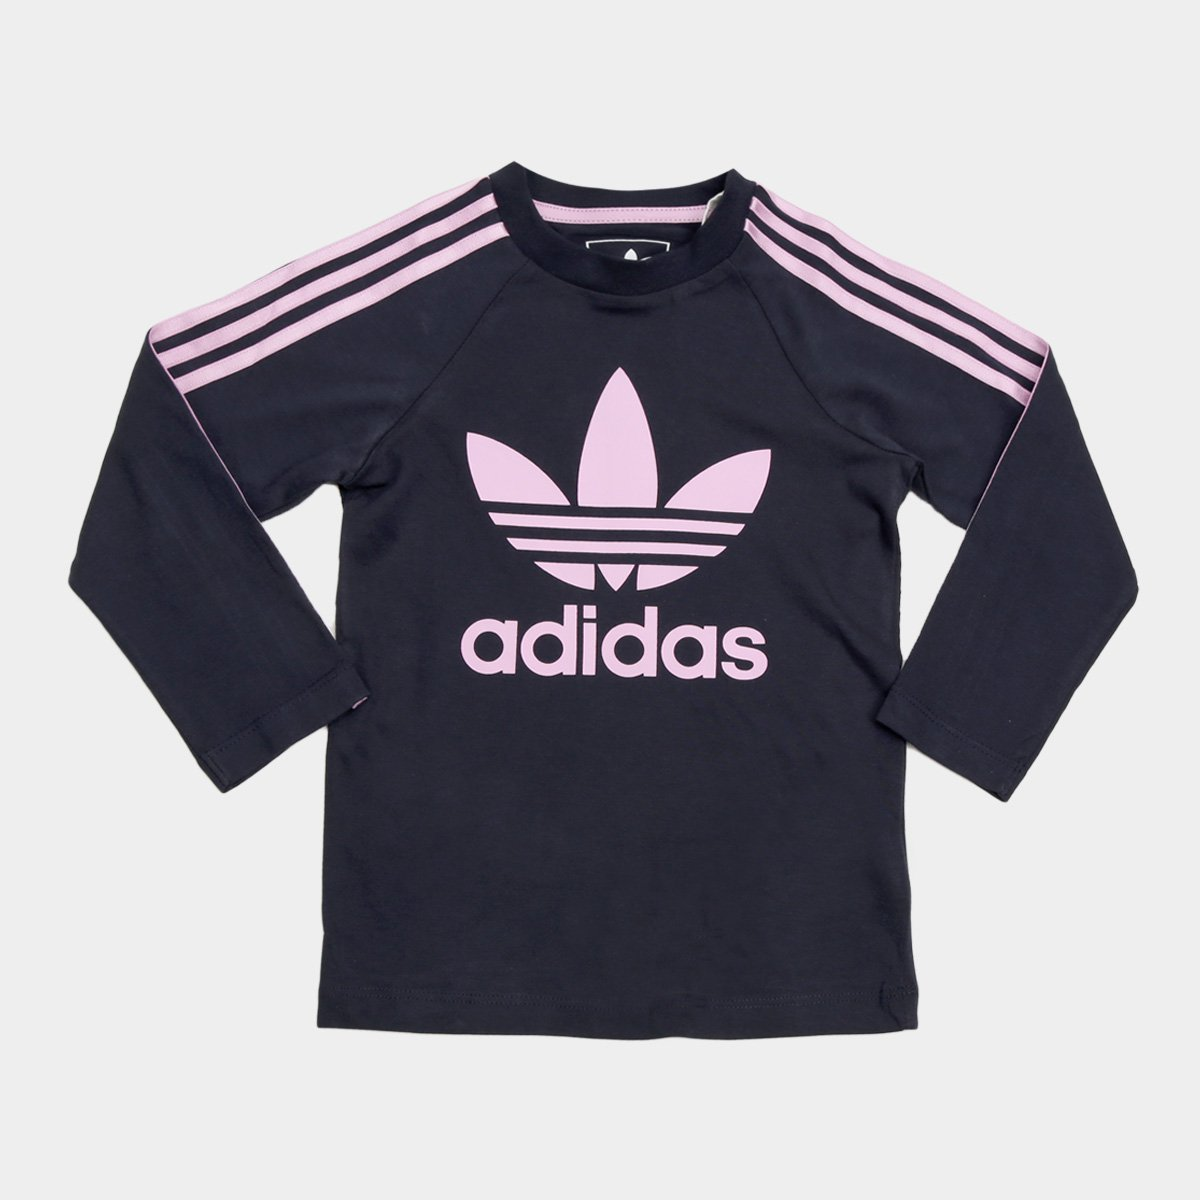 f82703284c6 Camiseta Infantil Adidas 3 Stripes Ls Manga Longa Feminina - Compre Agora